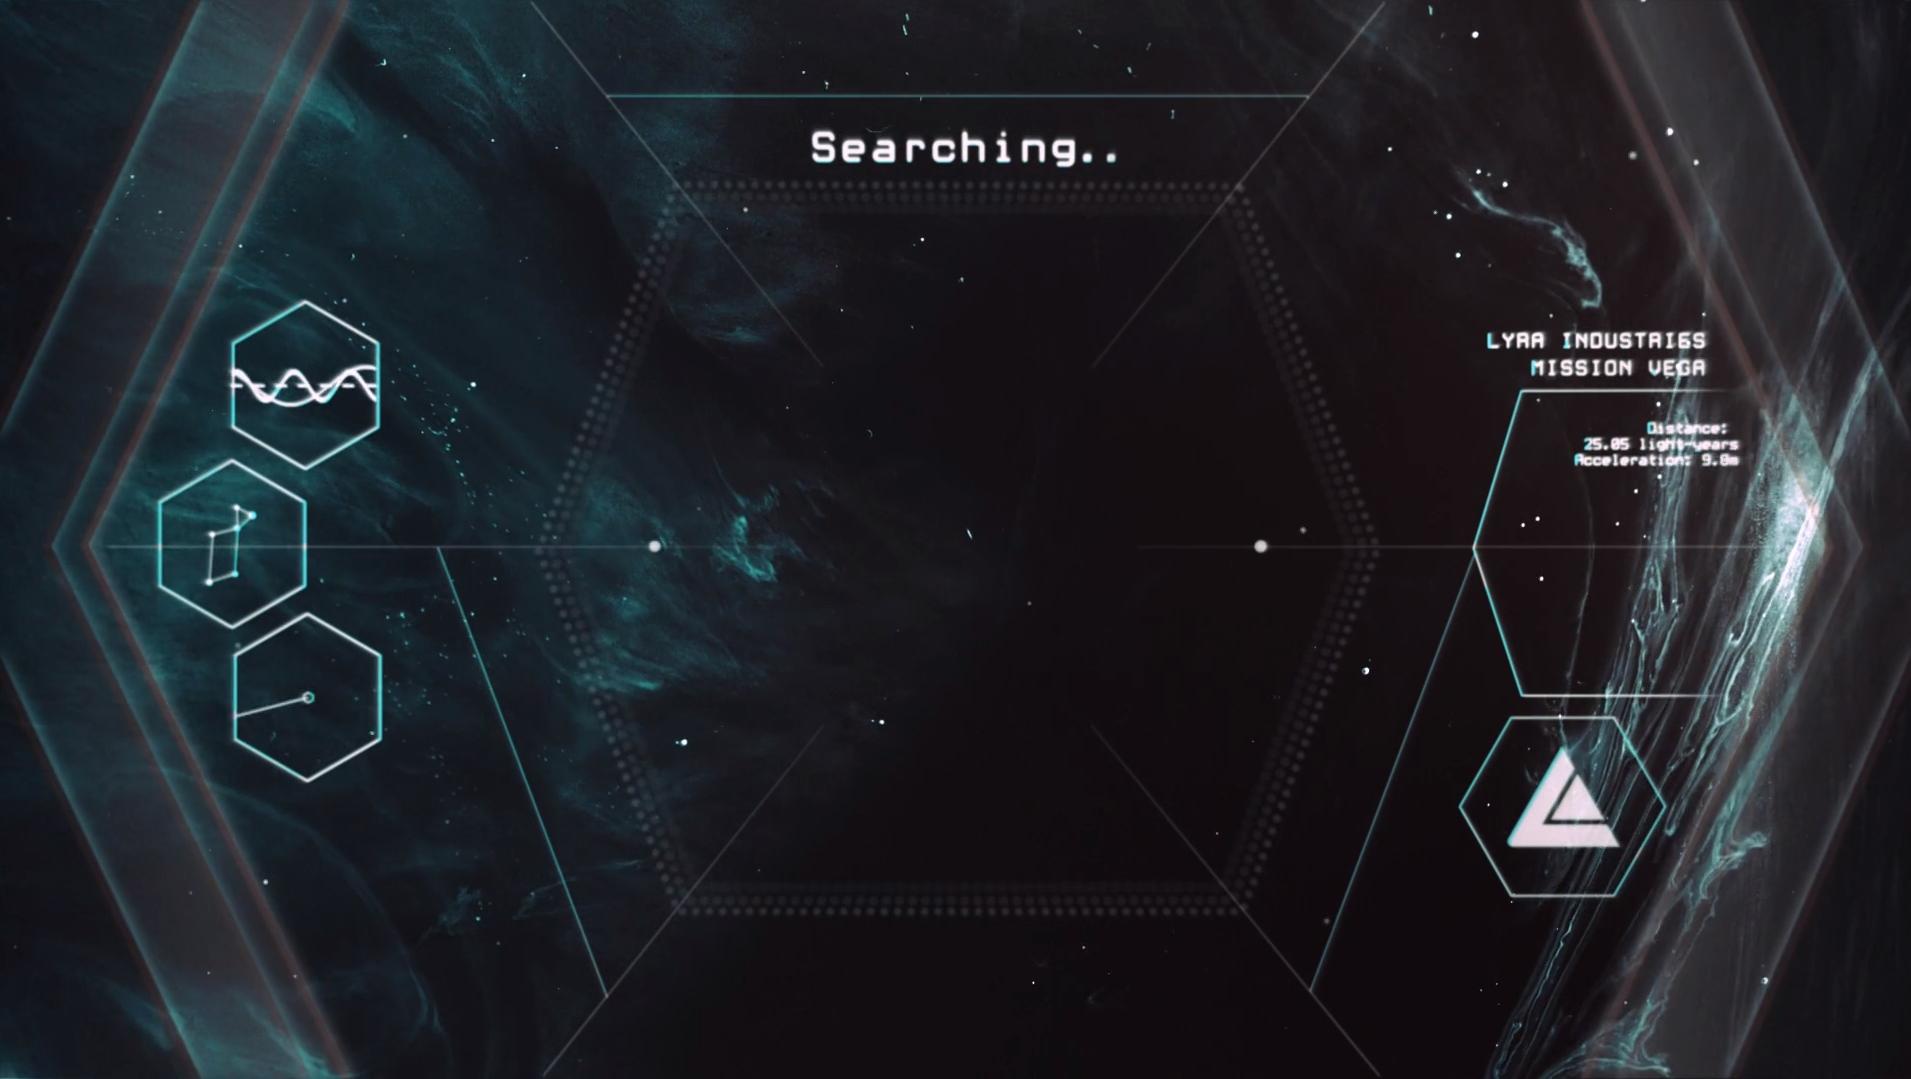 Copy of Mission Vega